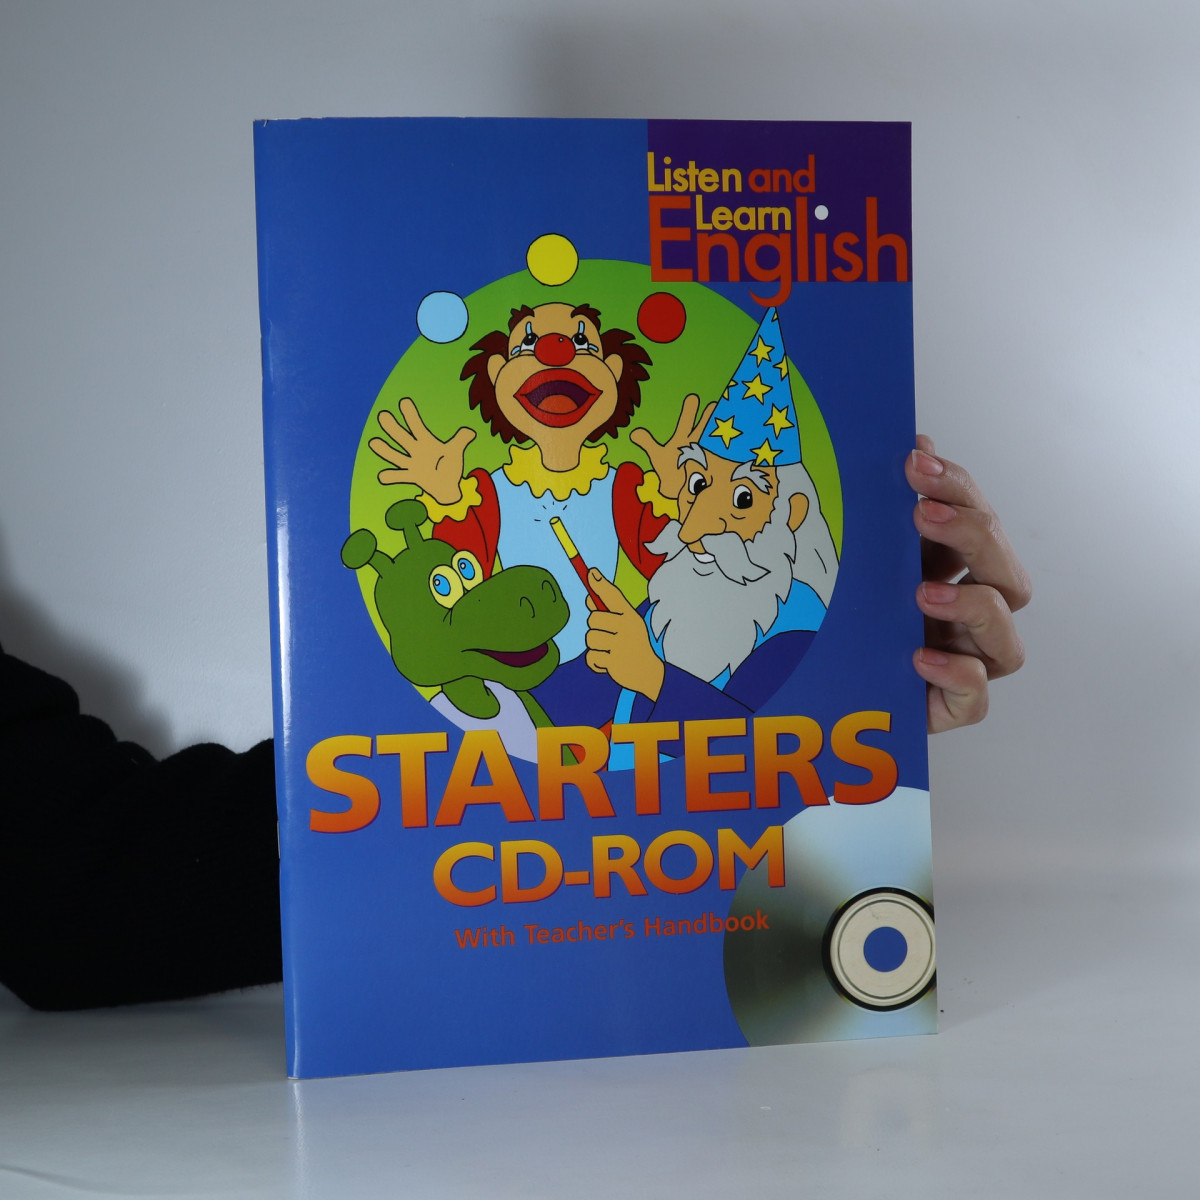 antikvární kniha Starters : CD-ROM, 2005